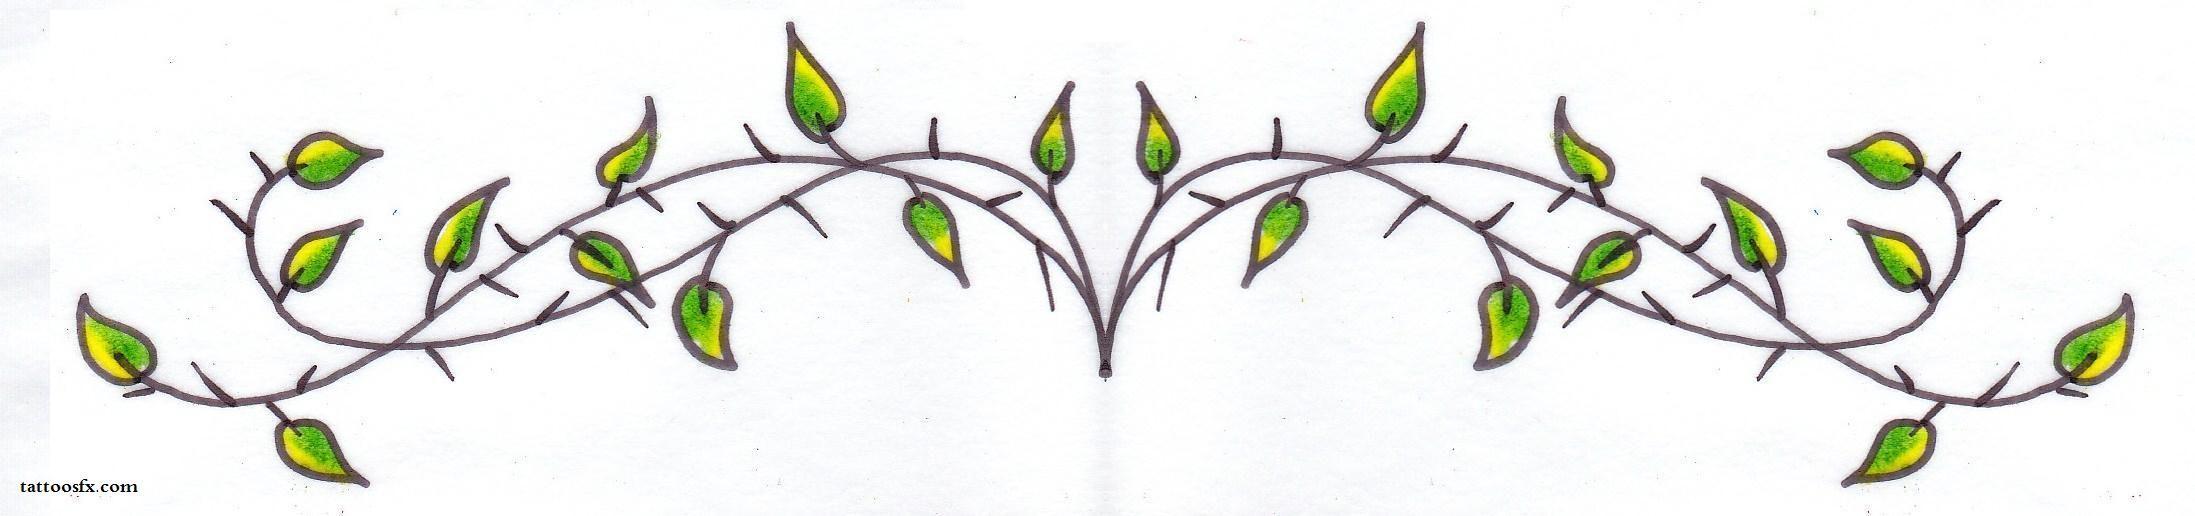 ivy vine tattoo design drawings leaf tattoo design leave tattoo design lower back tattoo. Black Bedroom Furniture Sets. Home Design Ideas